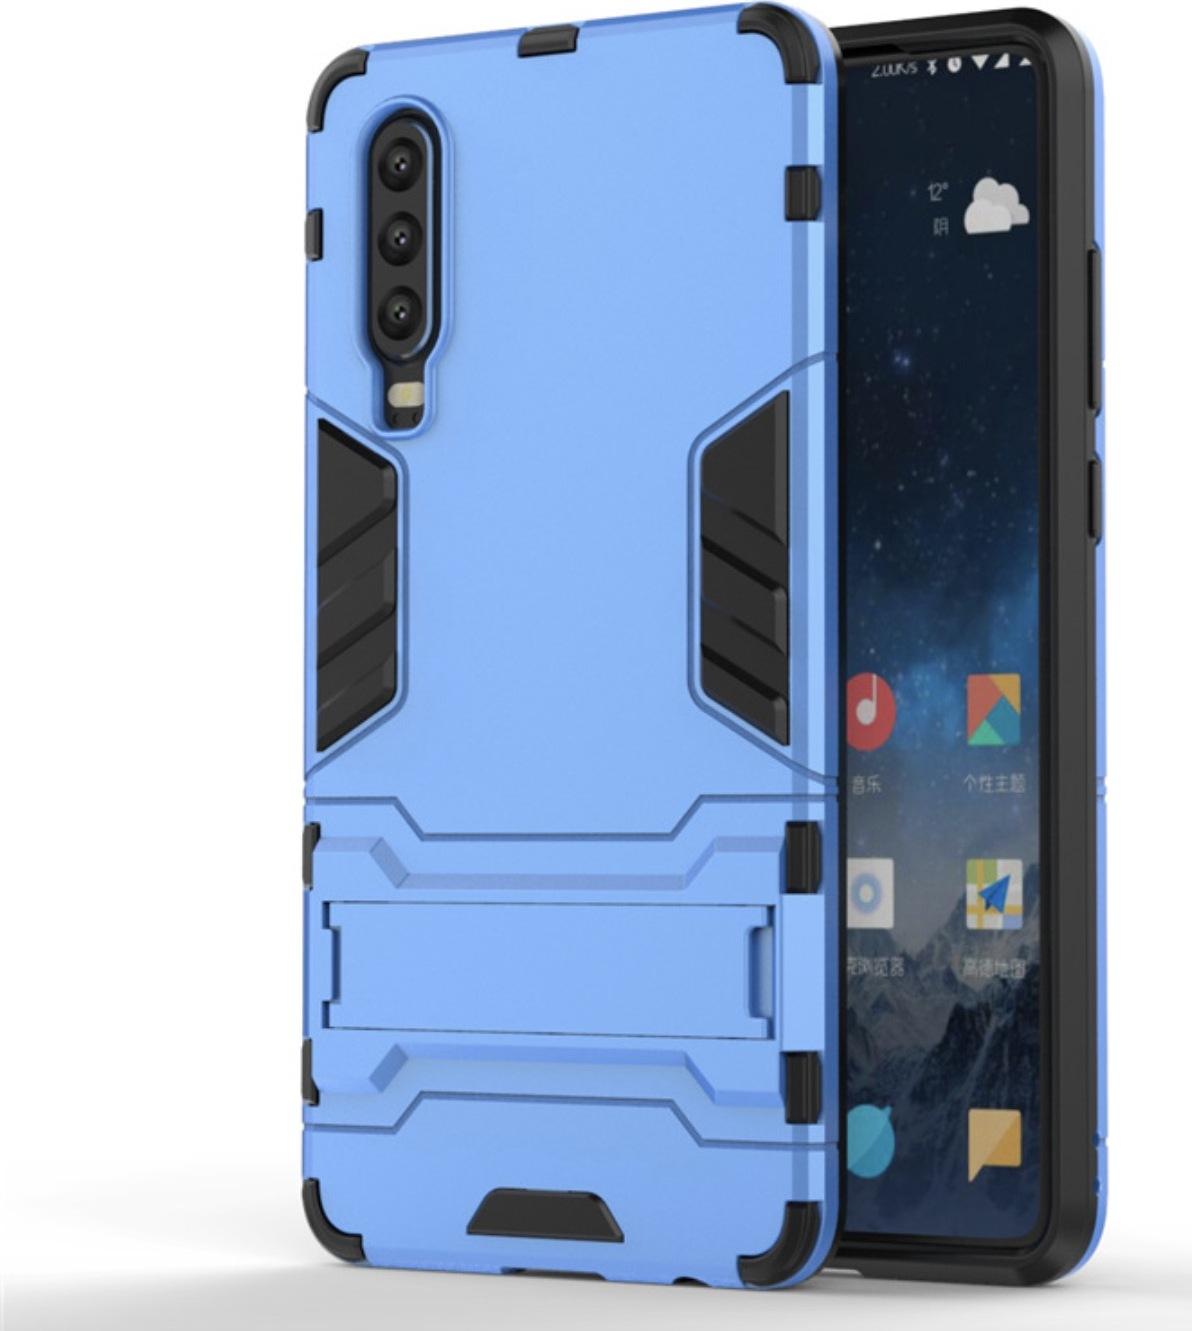 Чехол-бампер MyPads для Huawei Y5 2019/Huawei Honor 8S противоударный усиленный ударопрочный синий